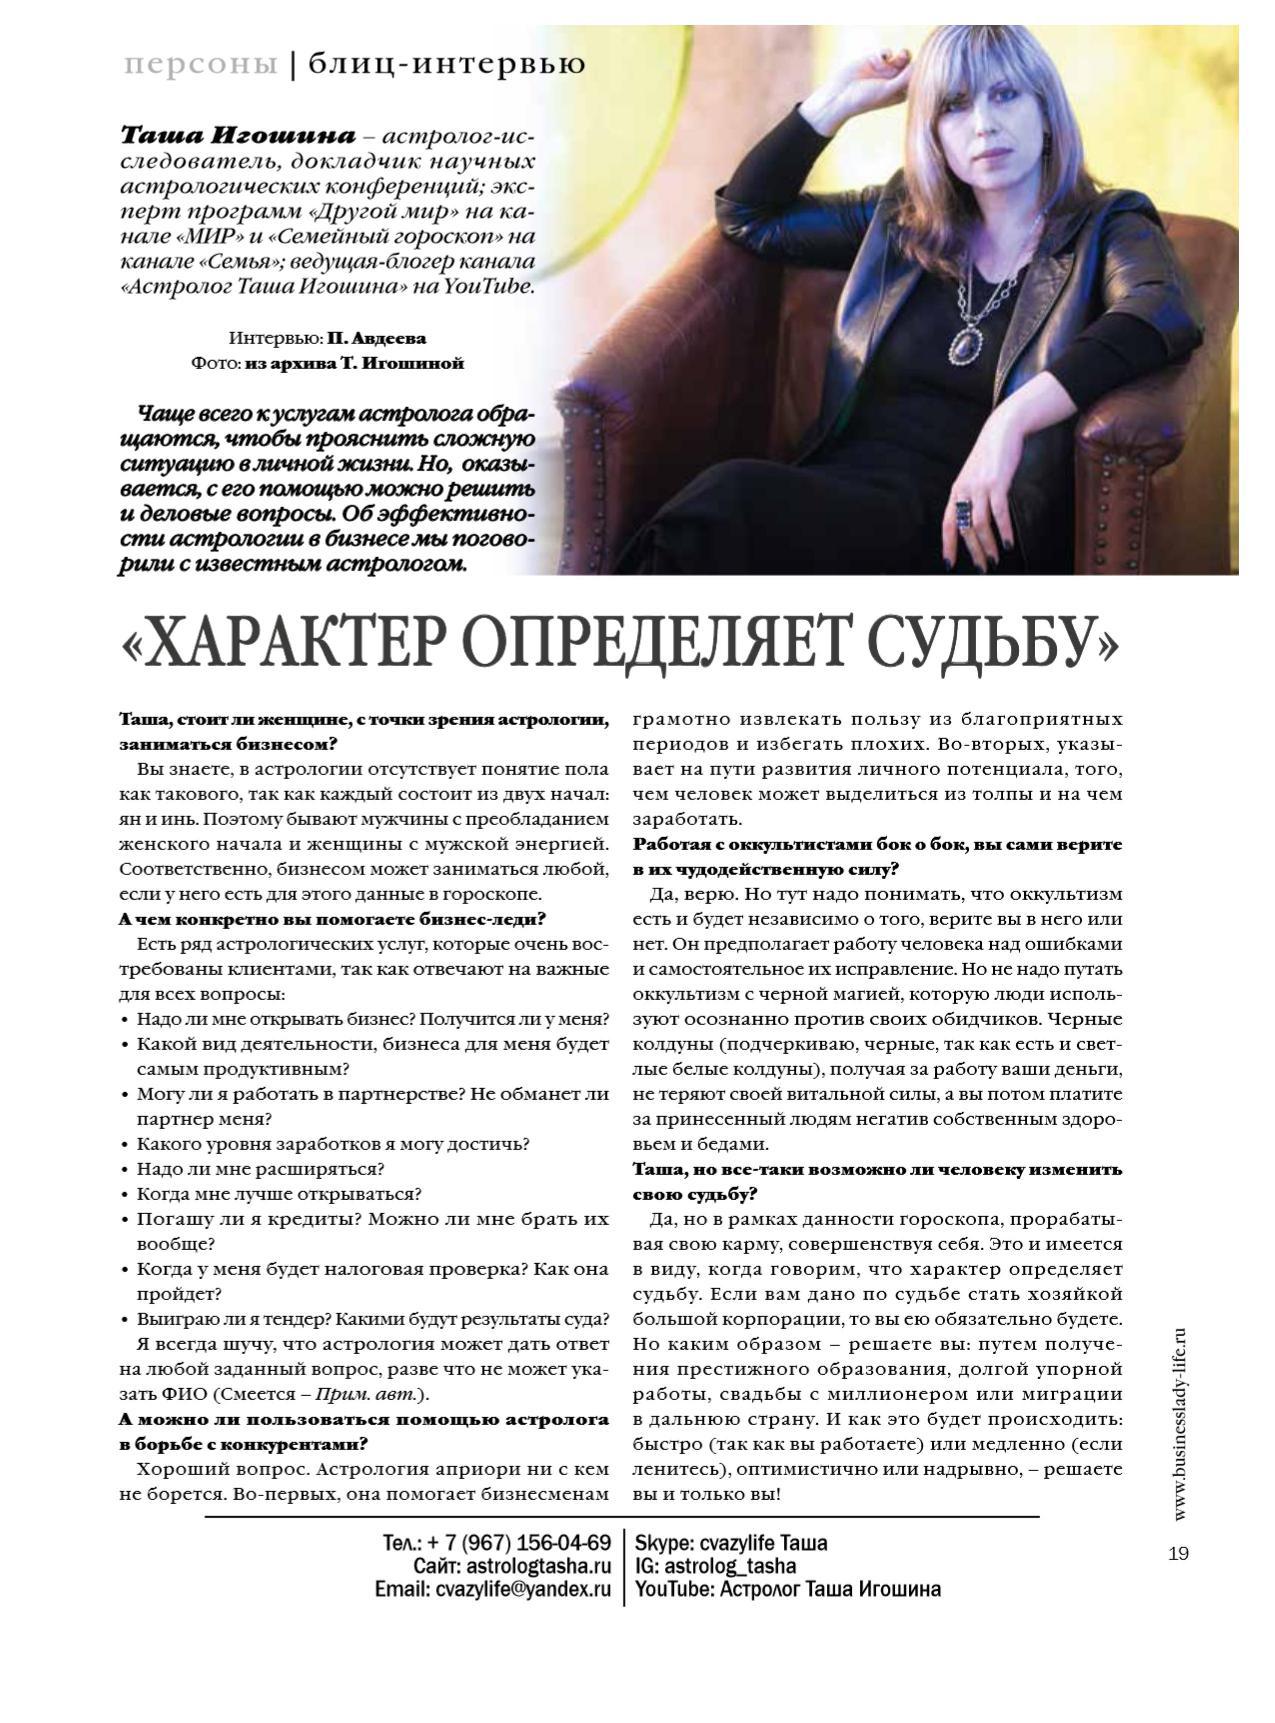 https://astrologtasha.ru/wp-content/uploads/2020/10/1.-112.2017-businesslady-life.ru-ХАРАКТЕР-ОПРЕДЕЛЯЕТ-СУДЬБУ-page-001-copy.jpg